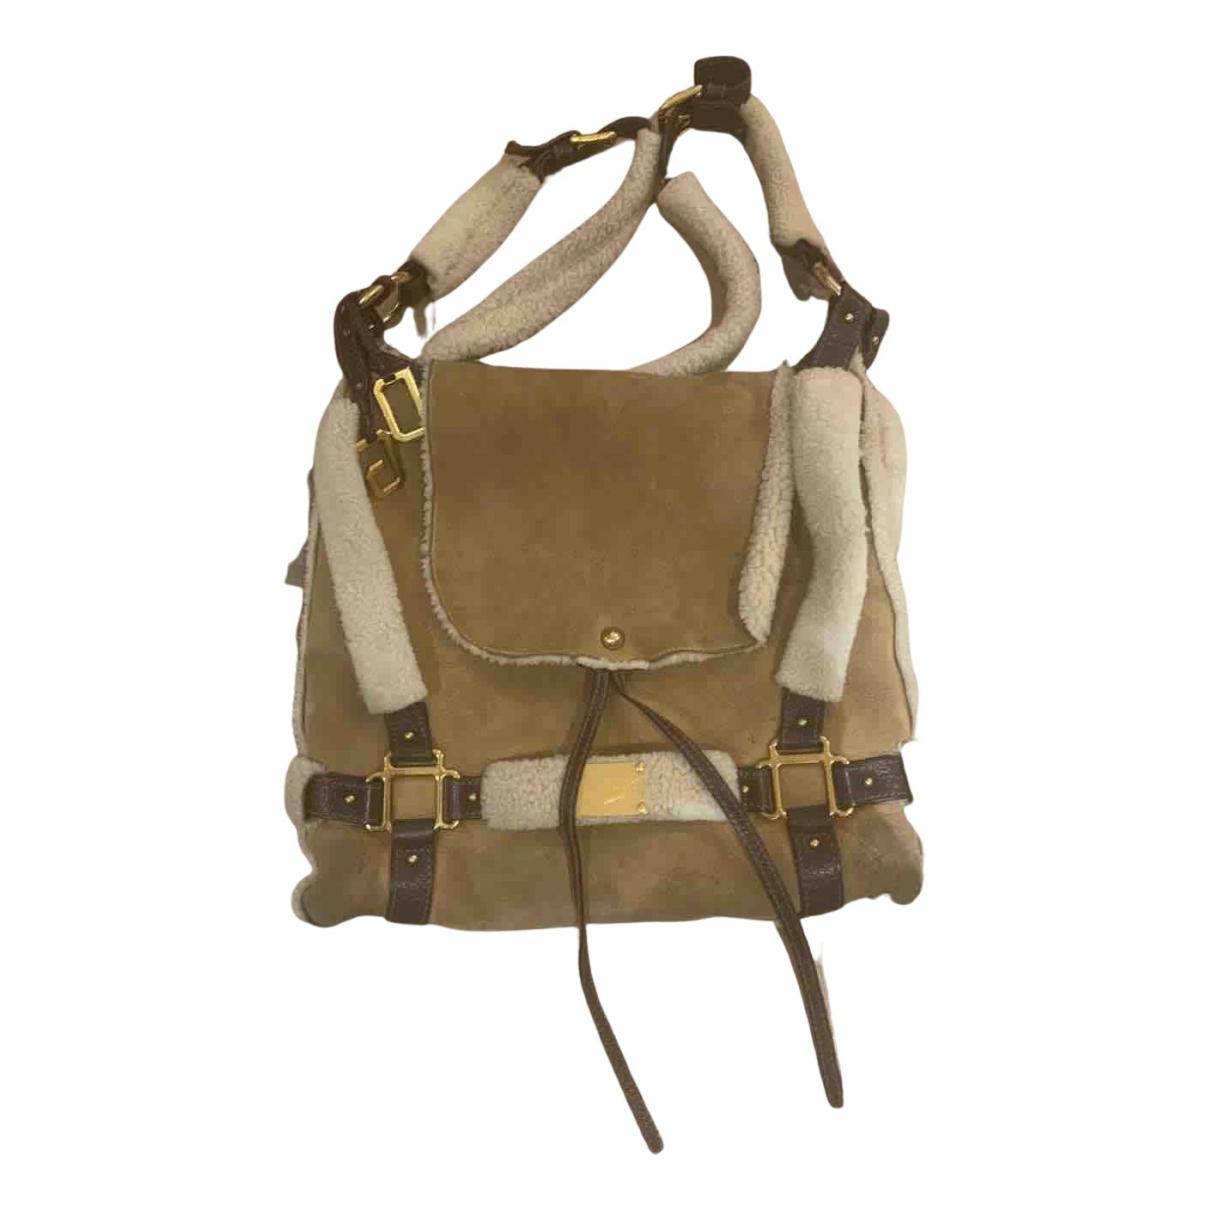 Dolce & Gabbana DG Girls Camel Suede handbag for Women N